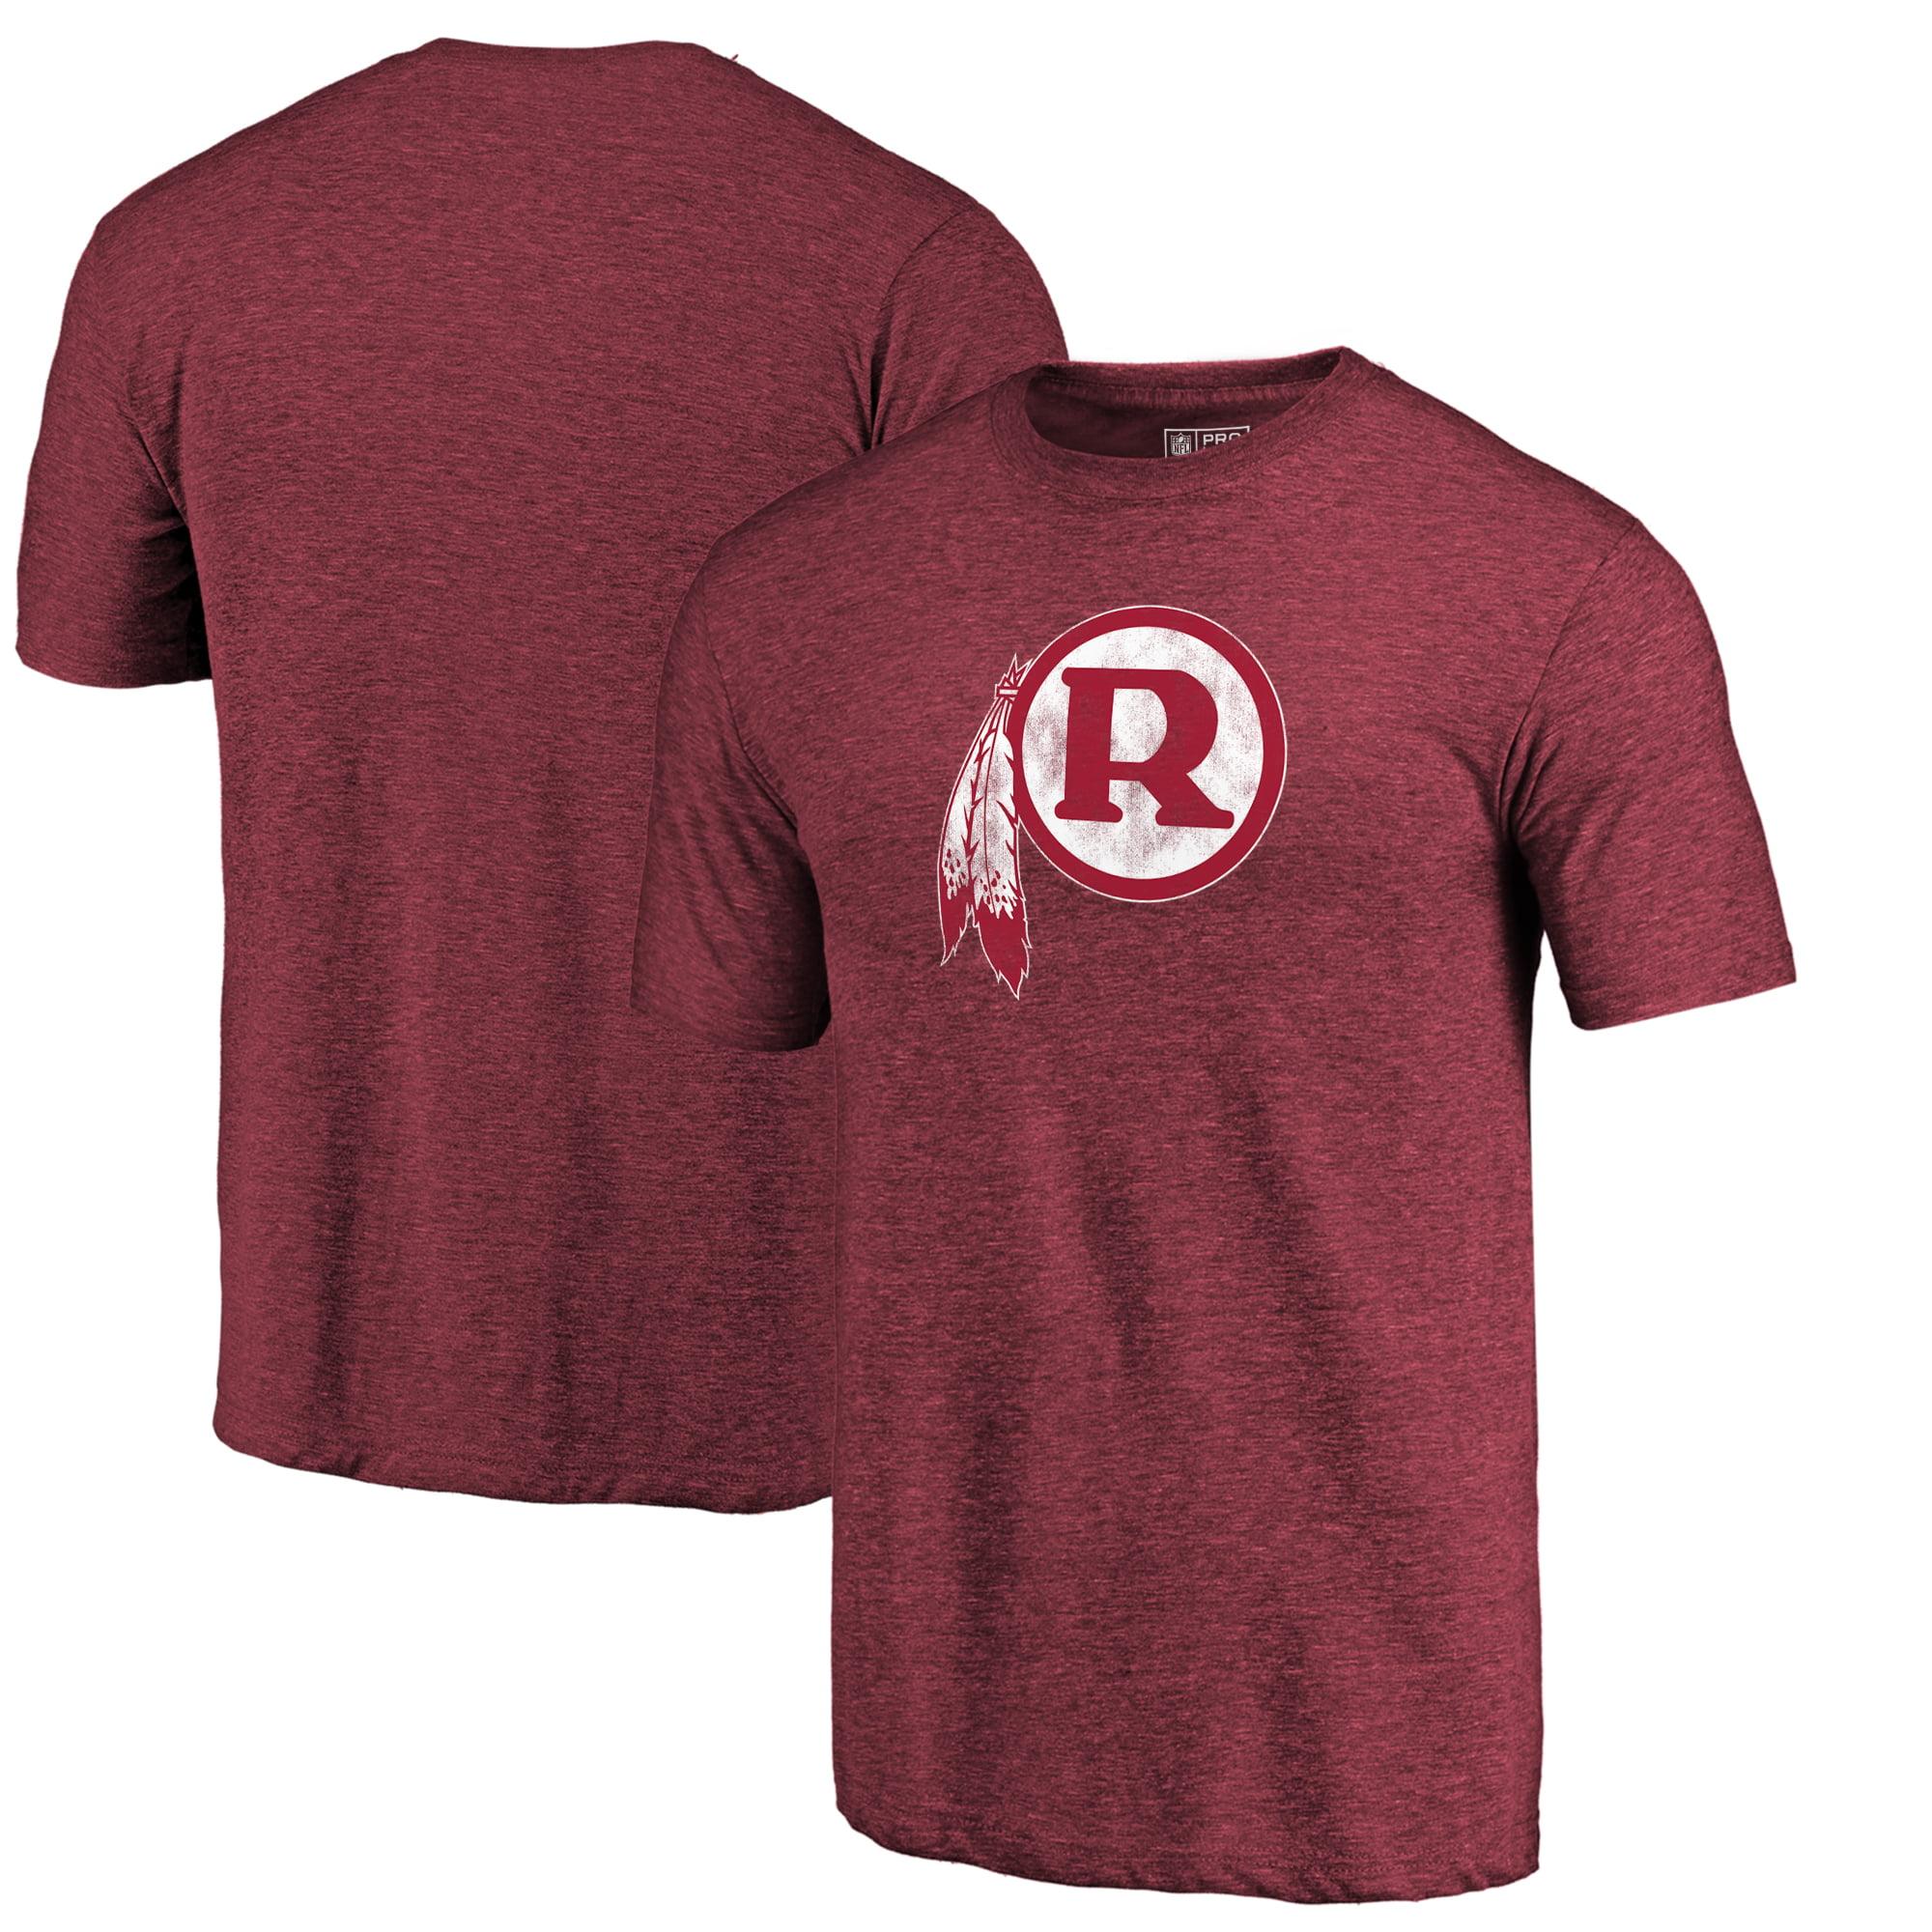 Washington Redskins Fanatics Branded Throwback Logo Tri-Blend T-Shirt - Burgundy